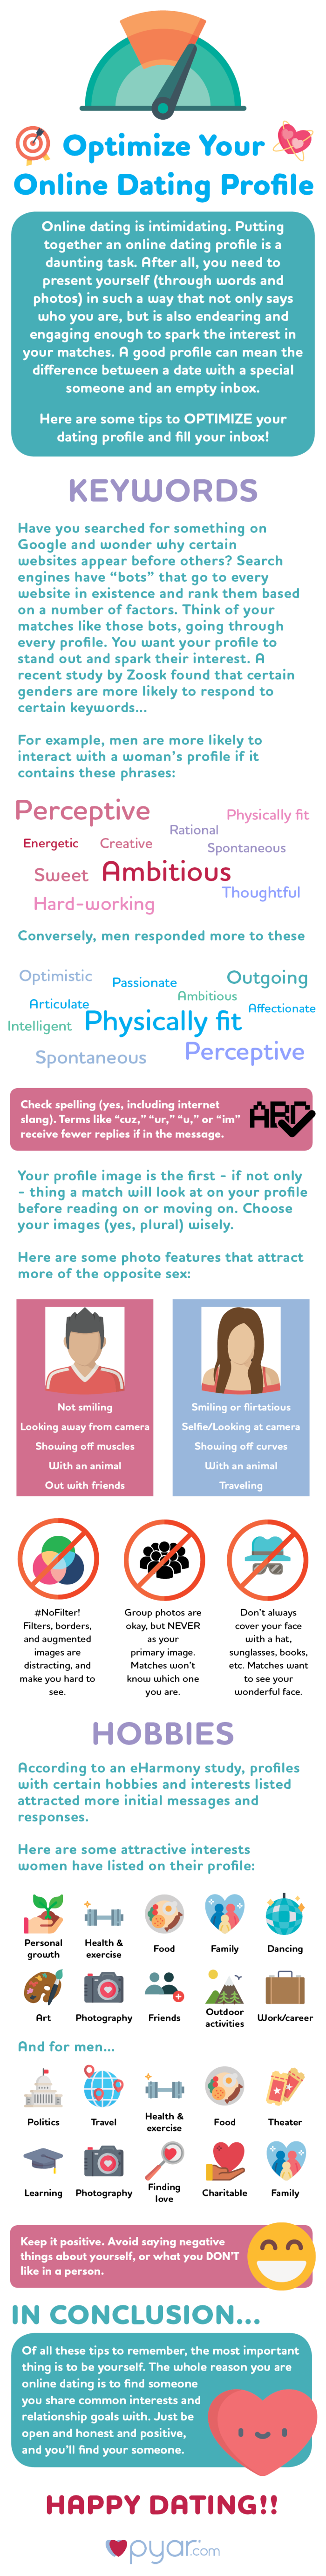 Optimizing your online profile